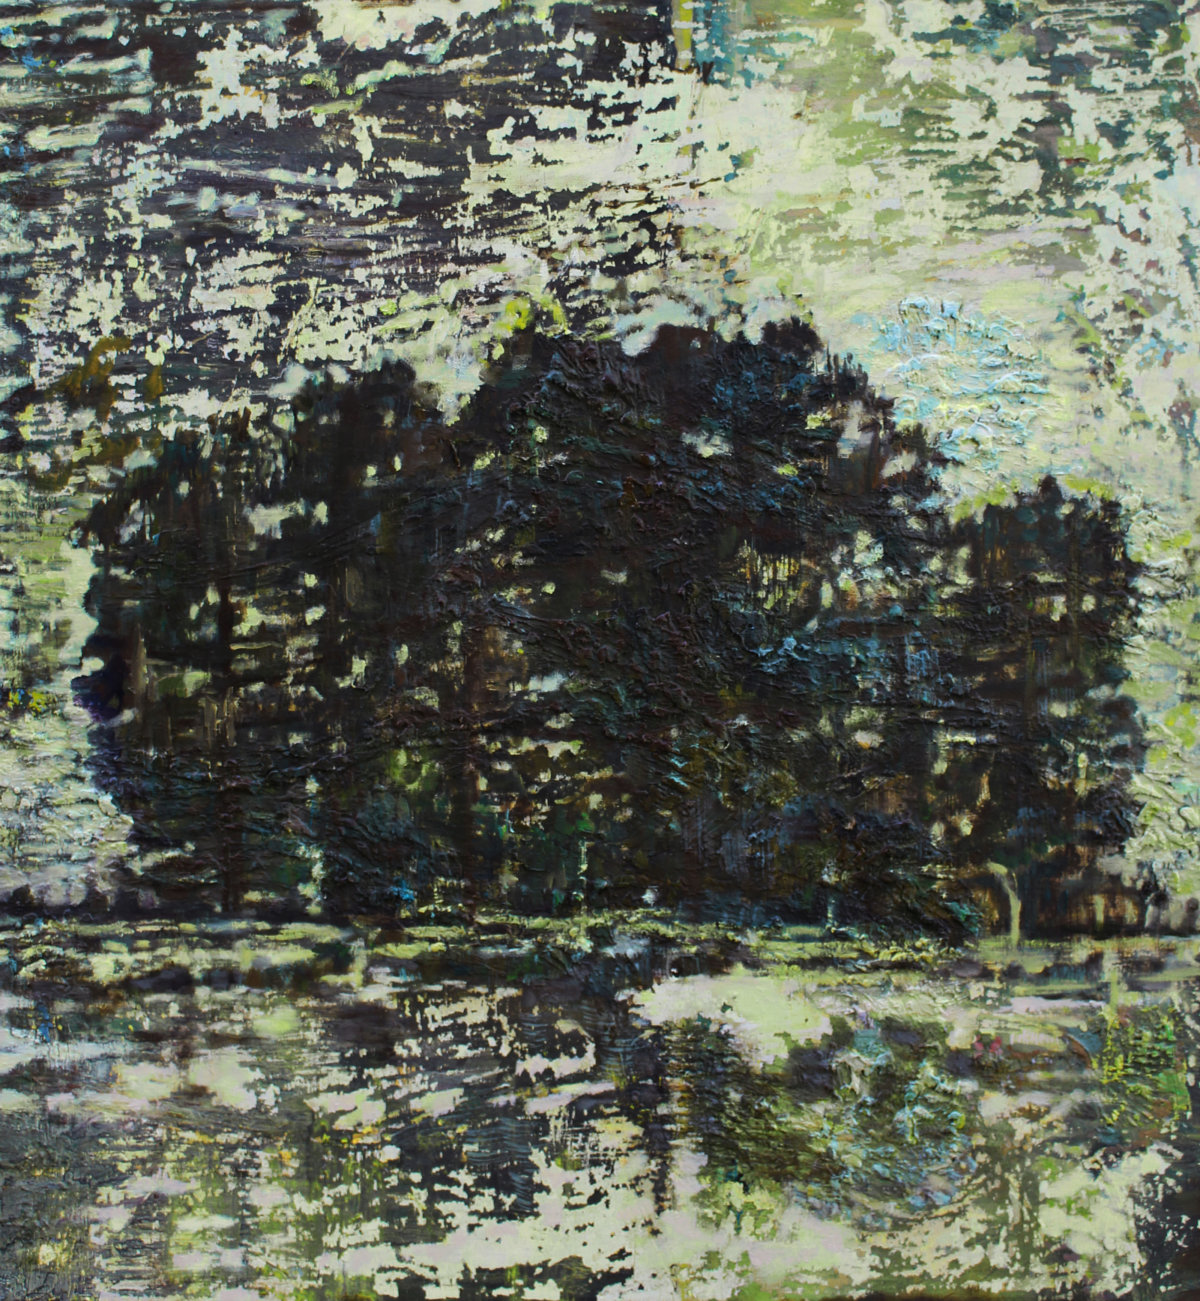 2016 Twilight 2 60 x 65 cm